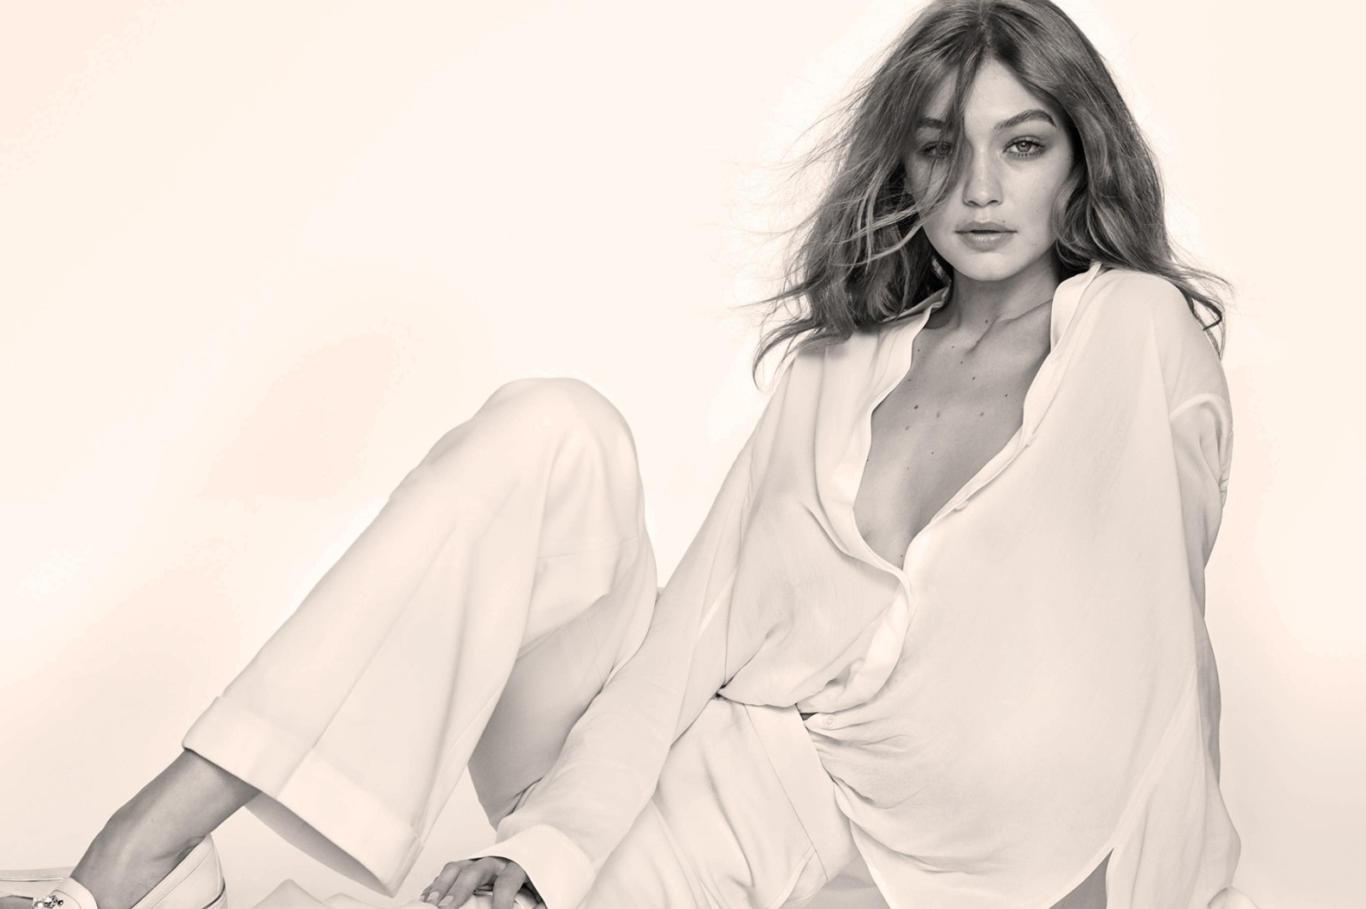 Gigi Hadid Super Hot HD Wallpaper Full